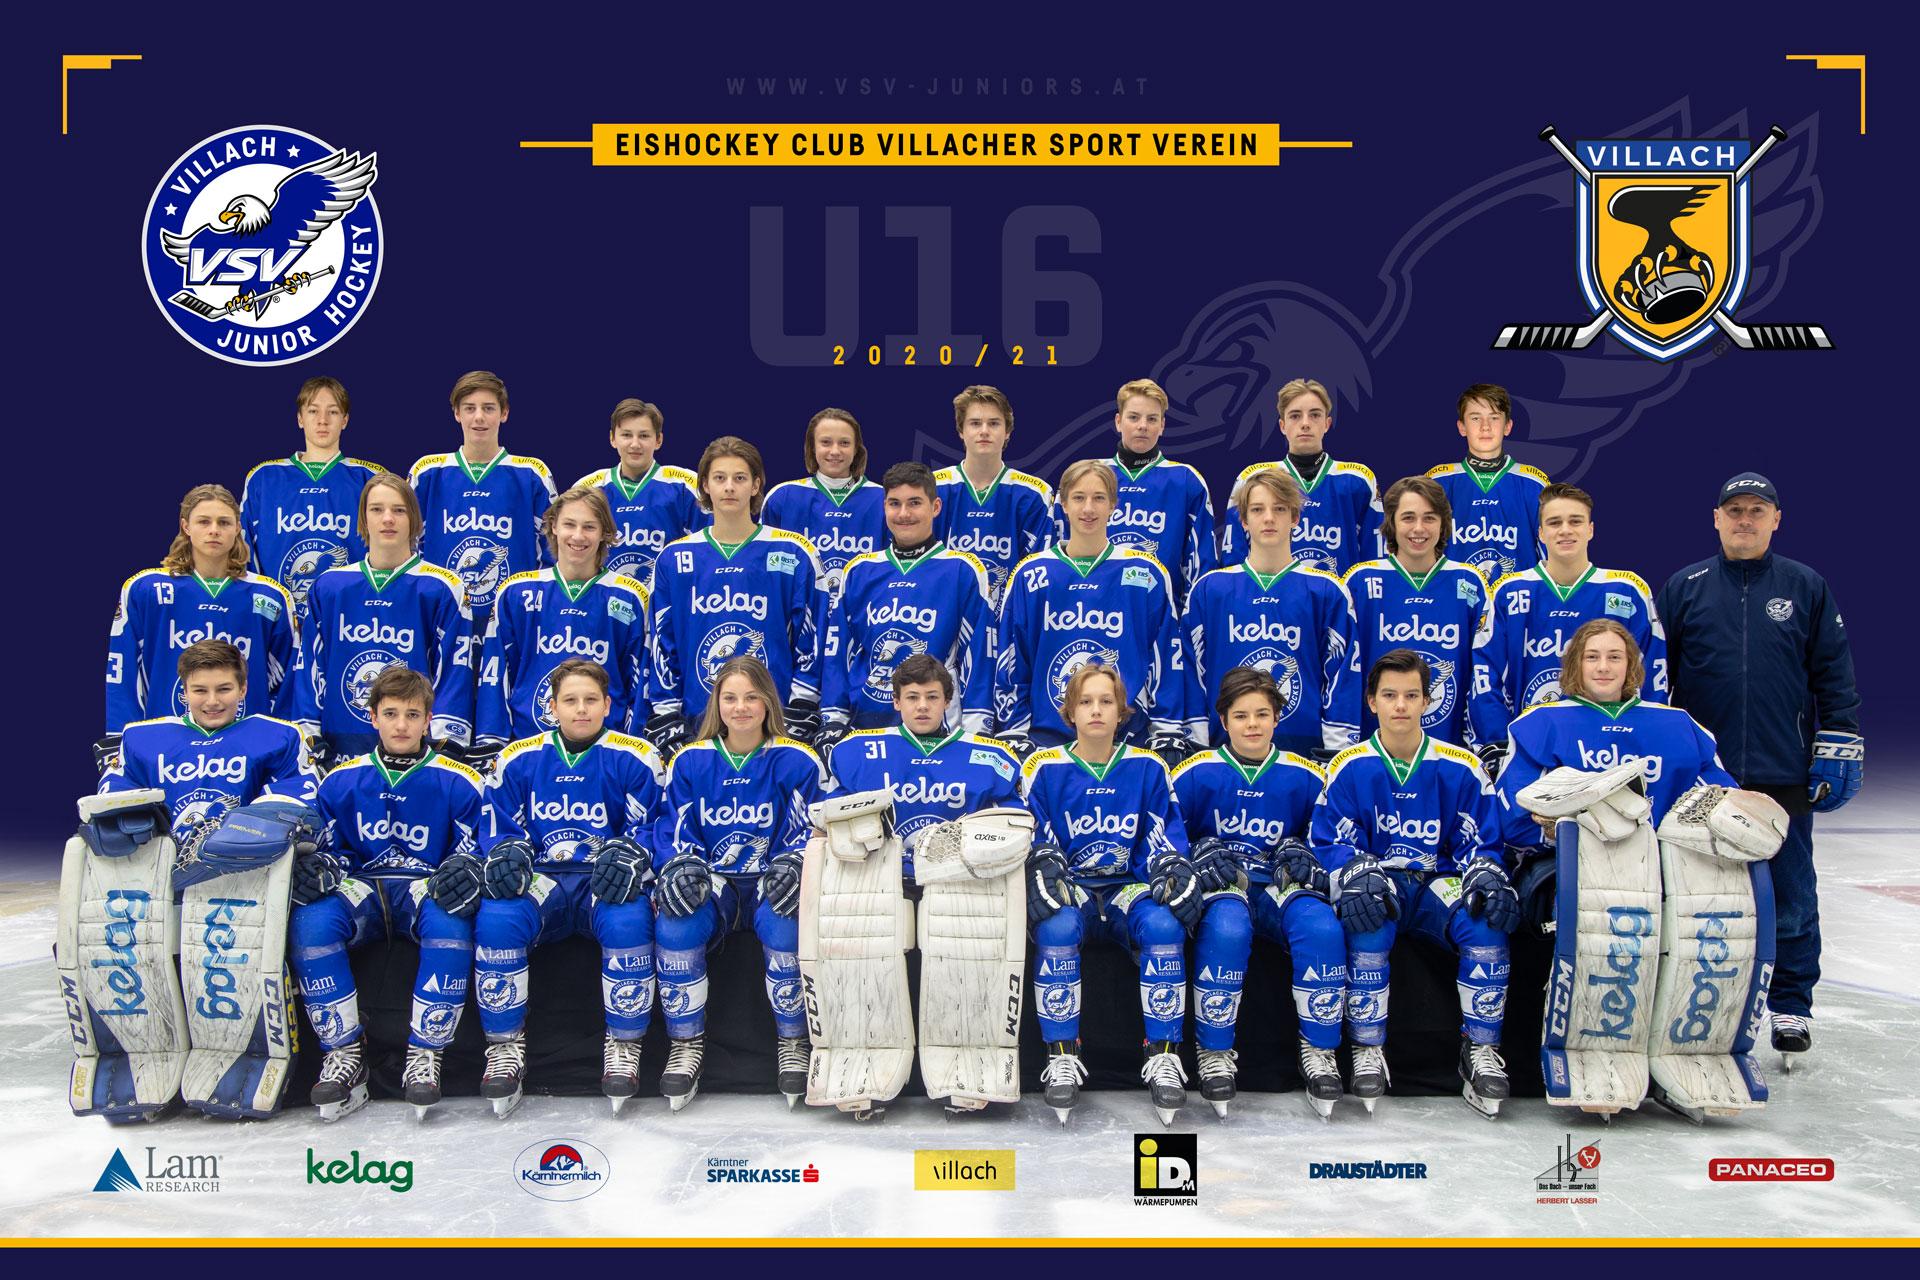 EC VSV U16 2020-21